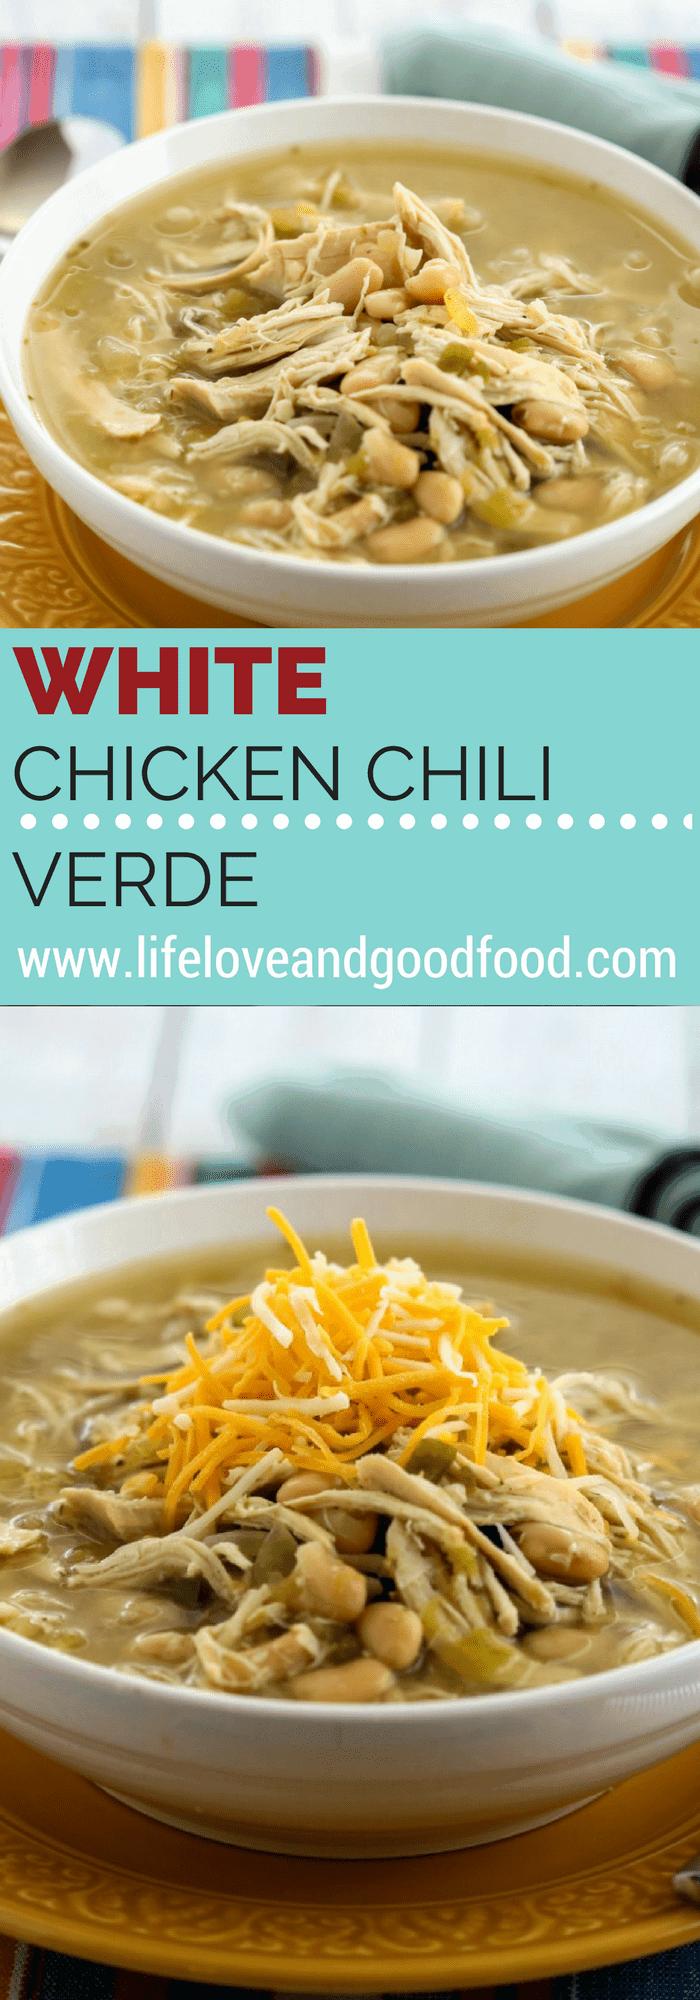 A bowl of White Chicken Chili Verde